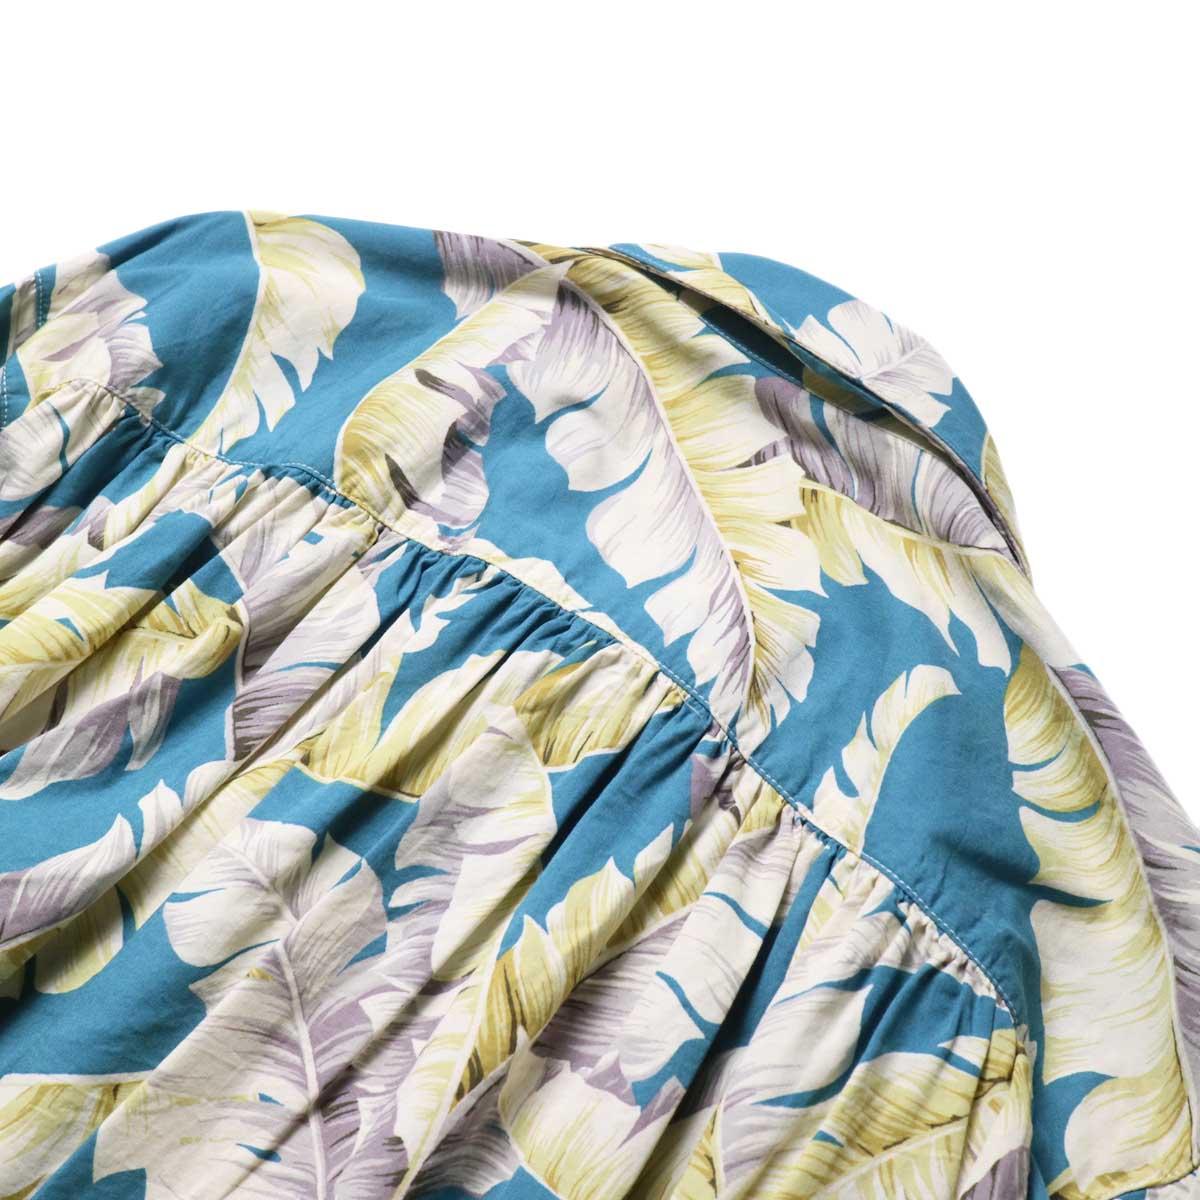 AiE / Painter Shirt - Hawaiian Print (Turquoise)背面ギャザー